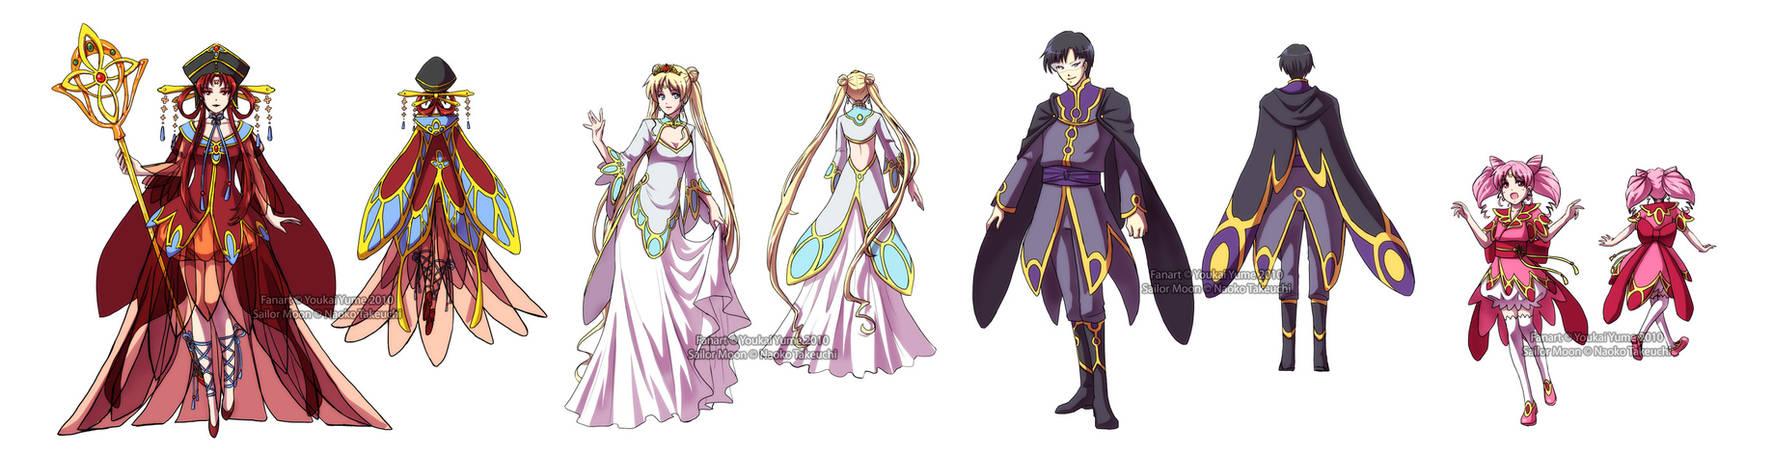 Kinmoku Fashion - Royalty